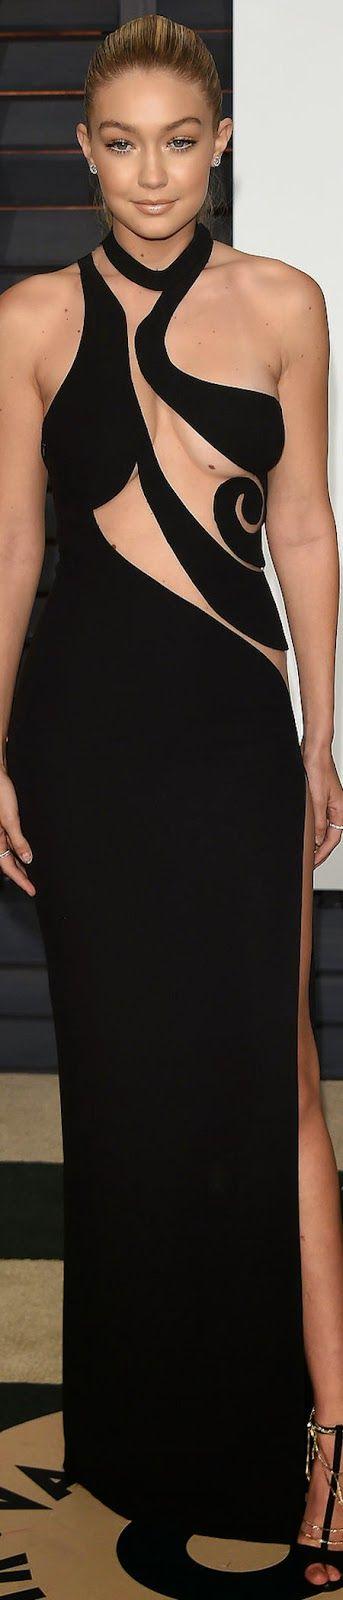 абитуриентска-дизайнерска-рокля-130